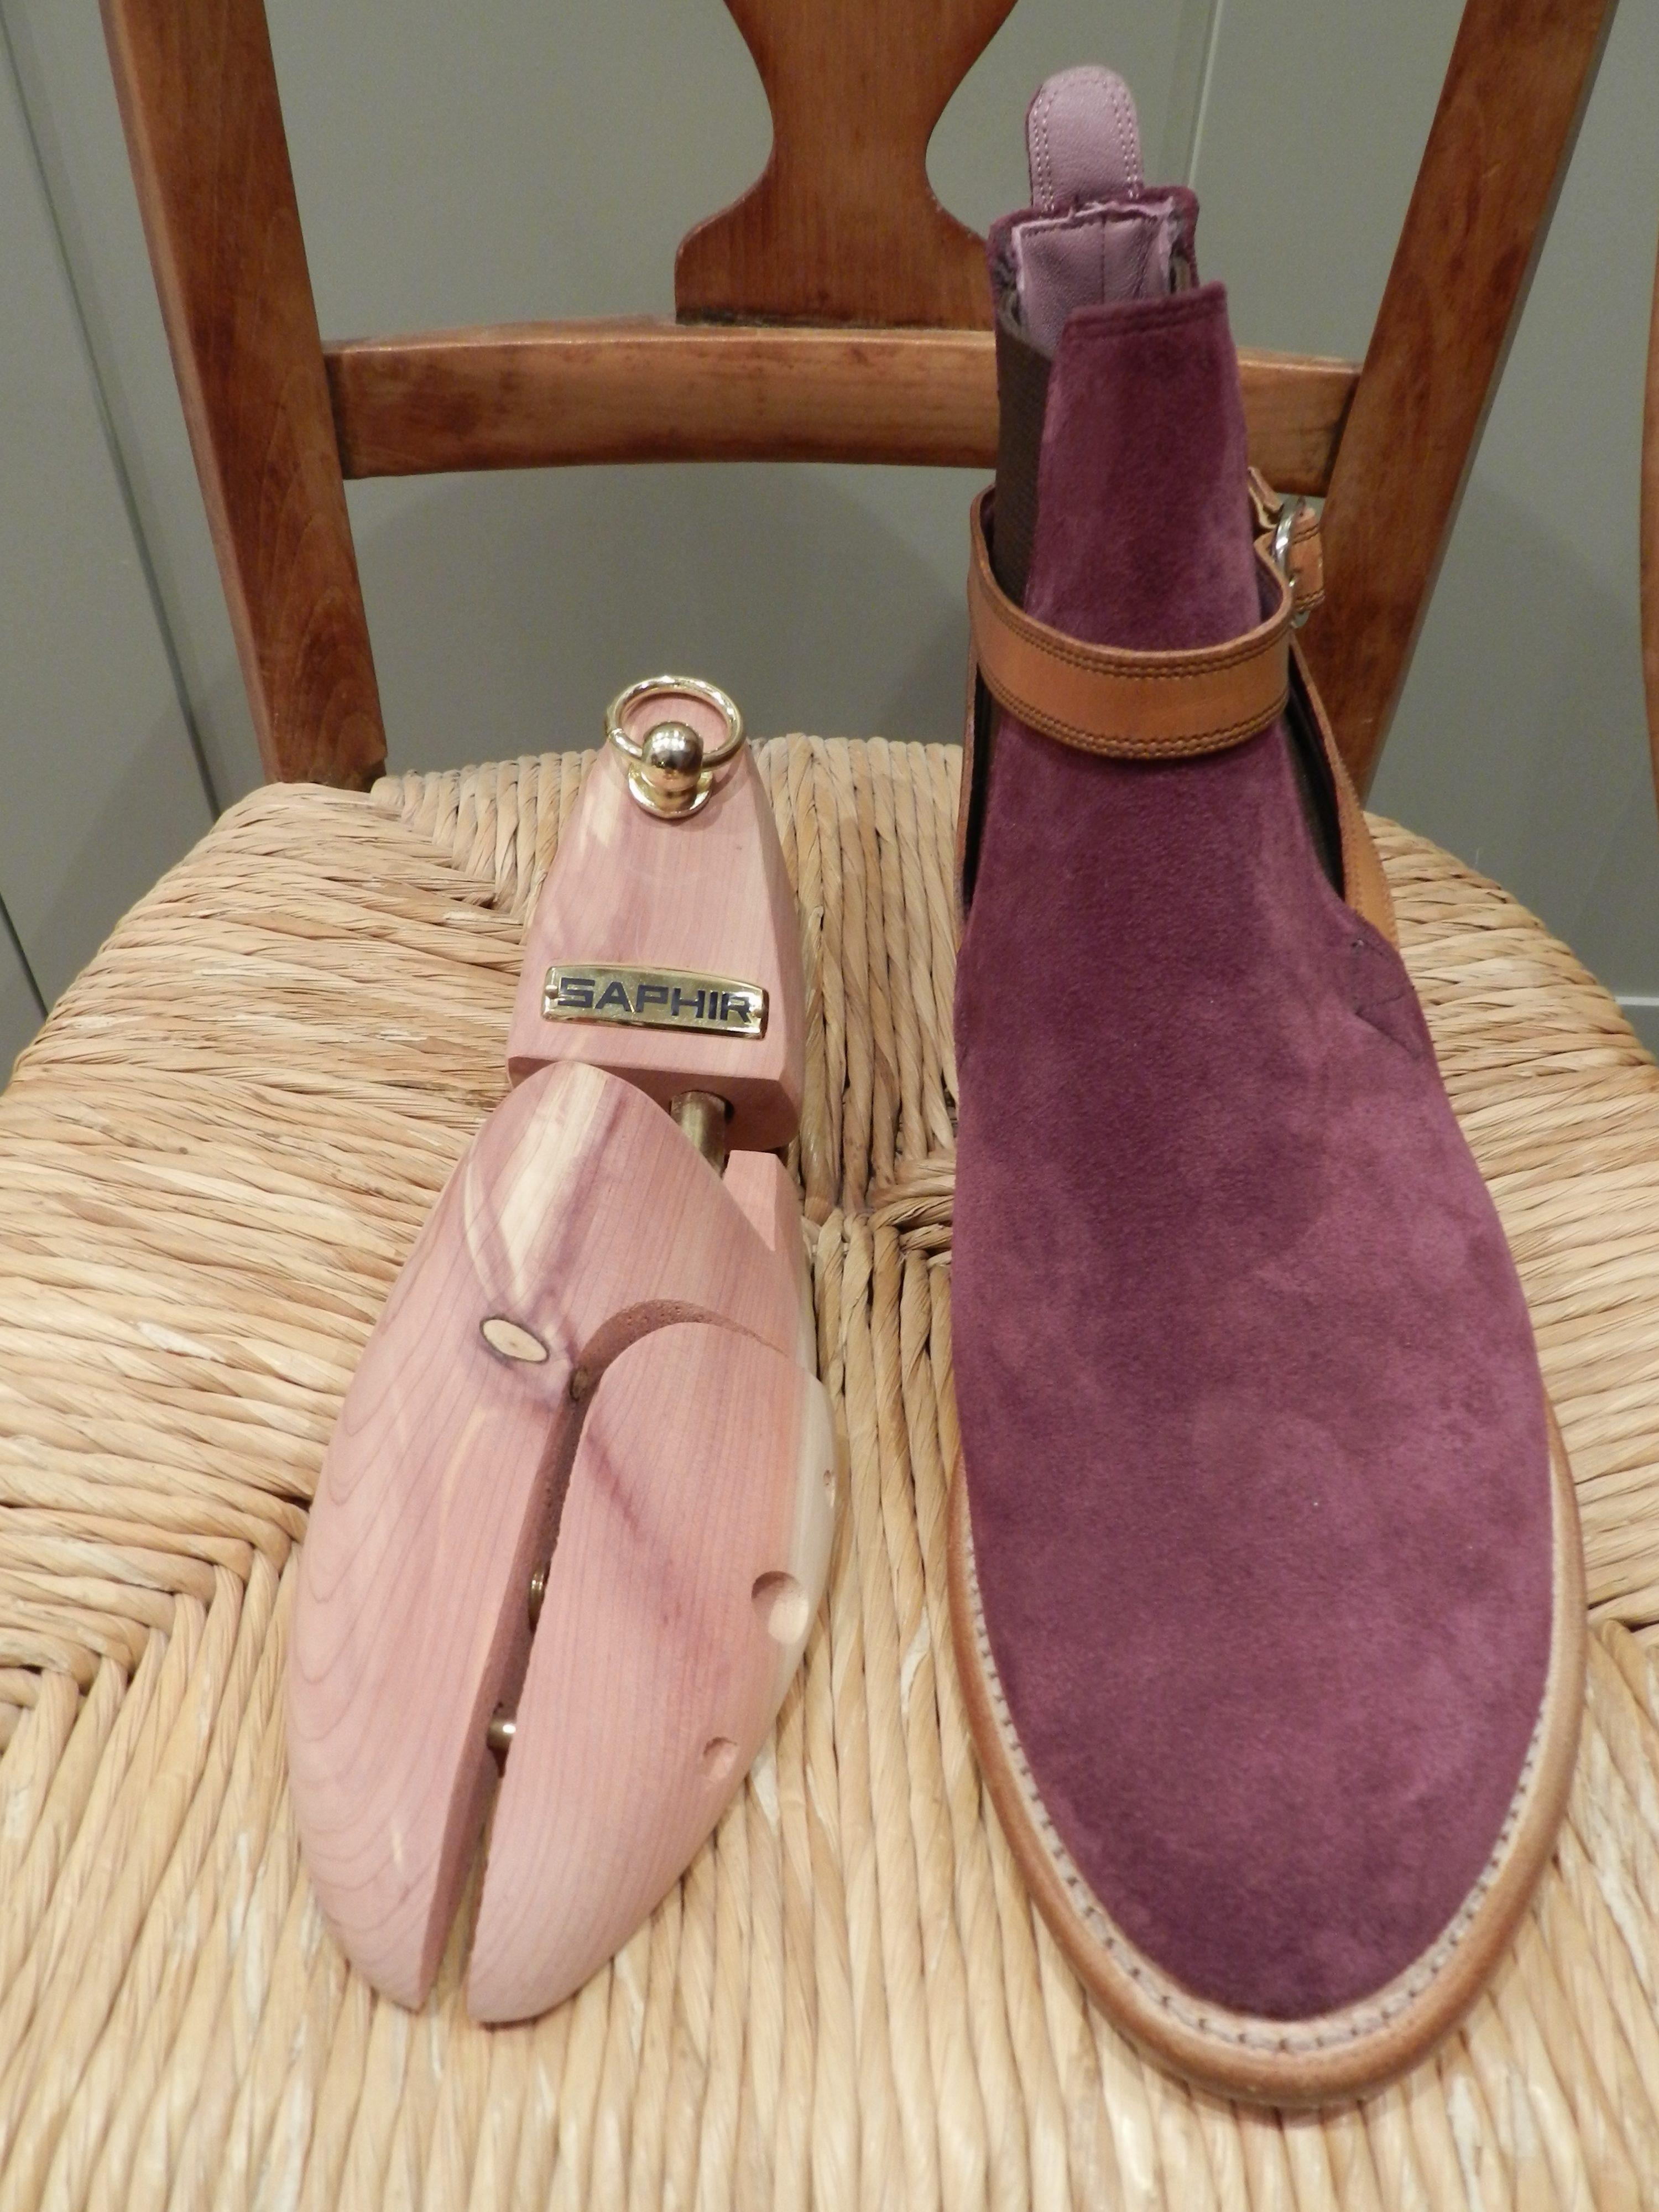 Saphir Cedar Shoe Trees £35.00